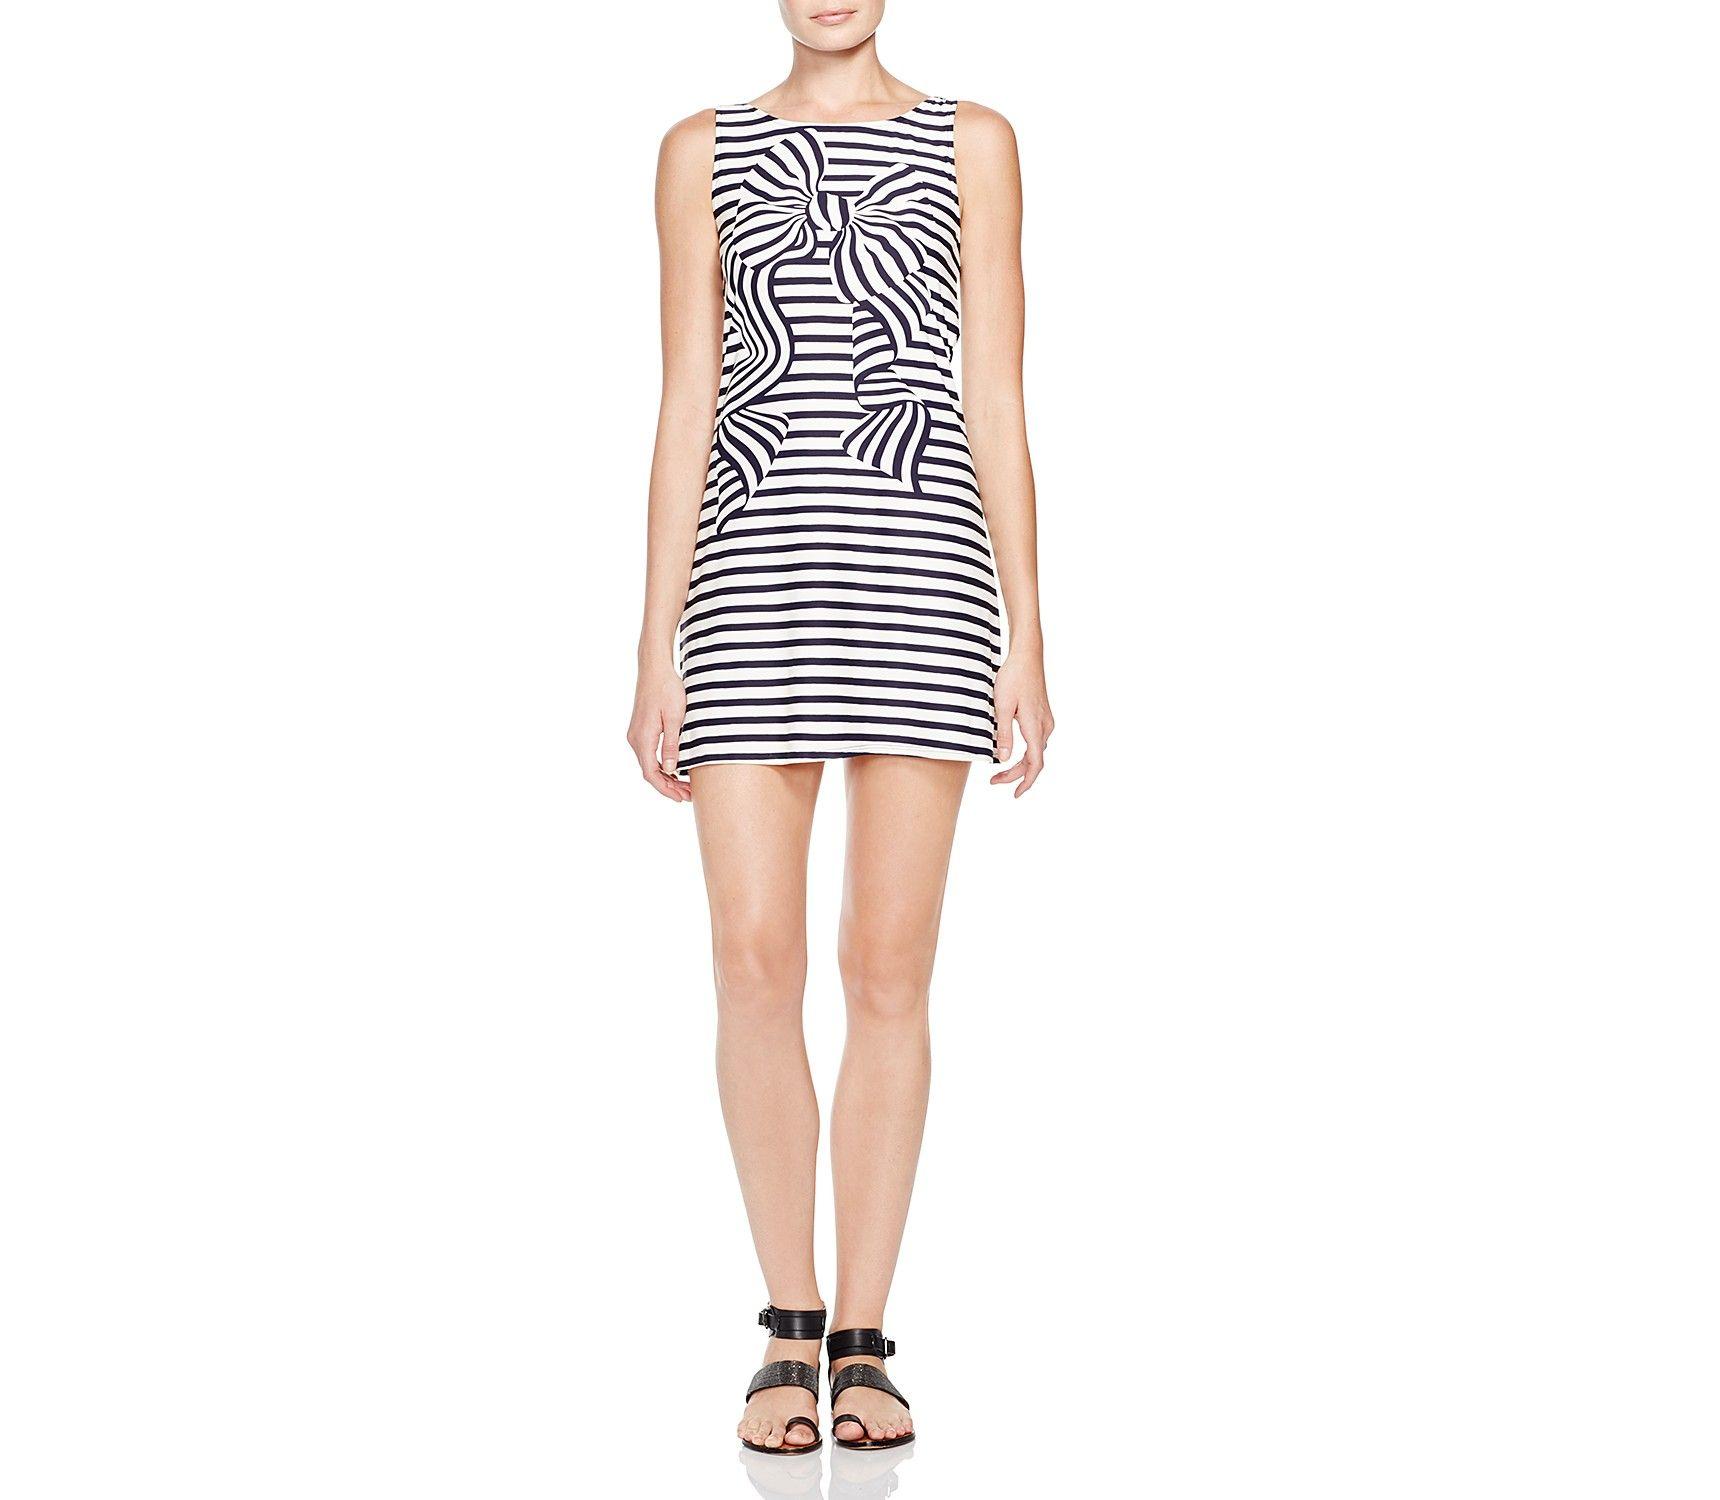 kate spade new york Nahant Shore Tank Dress Swim Cover Up | Bloomingdale's